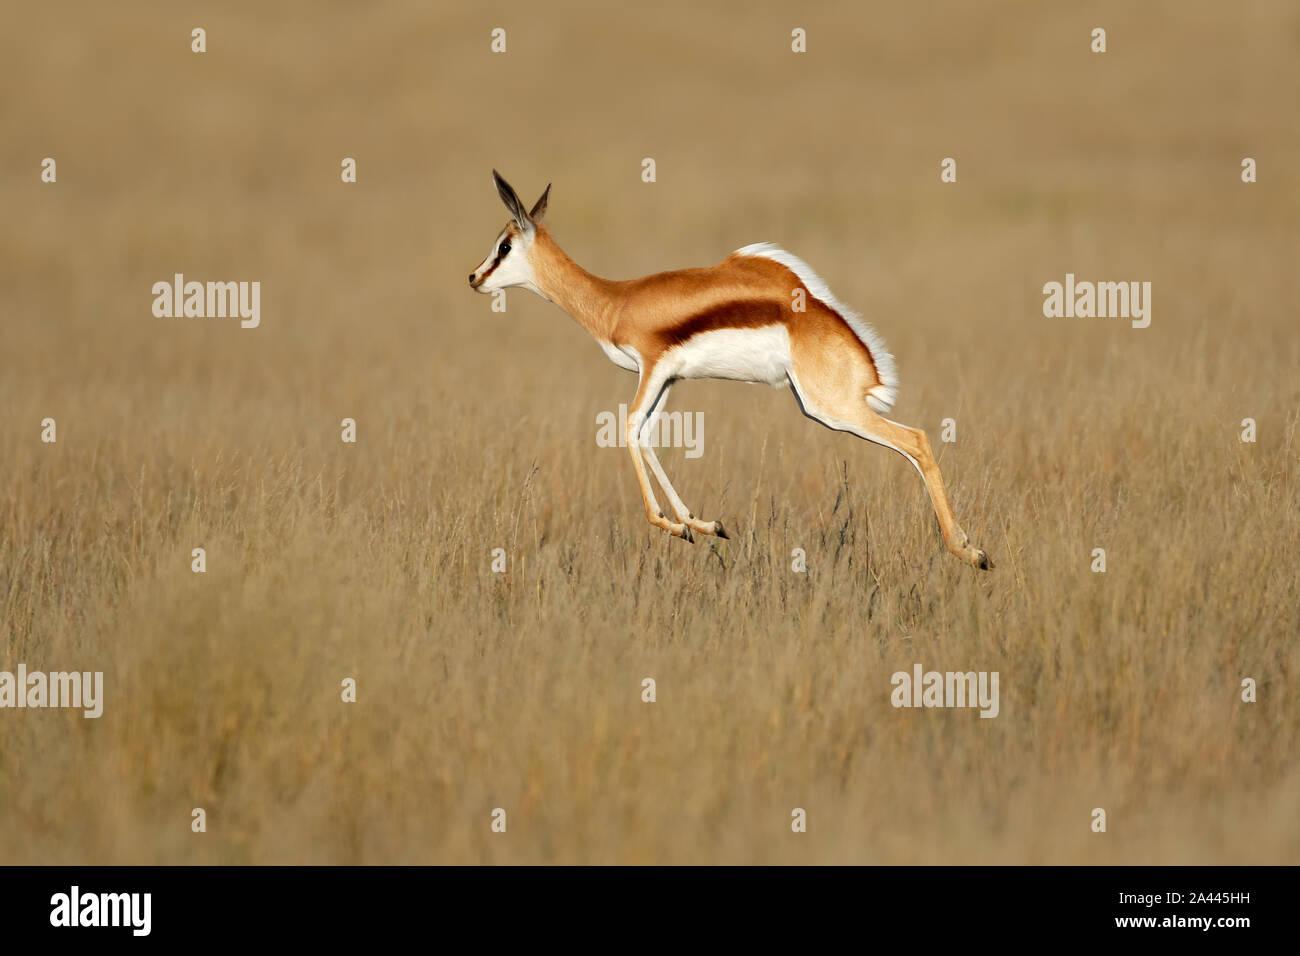 Jumping springbok antelope (Antidorcas marsupialis) in natural habitat, South Africa Stock Photo